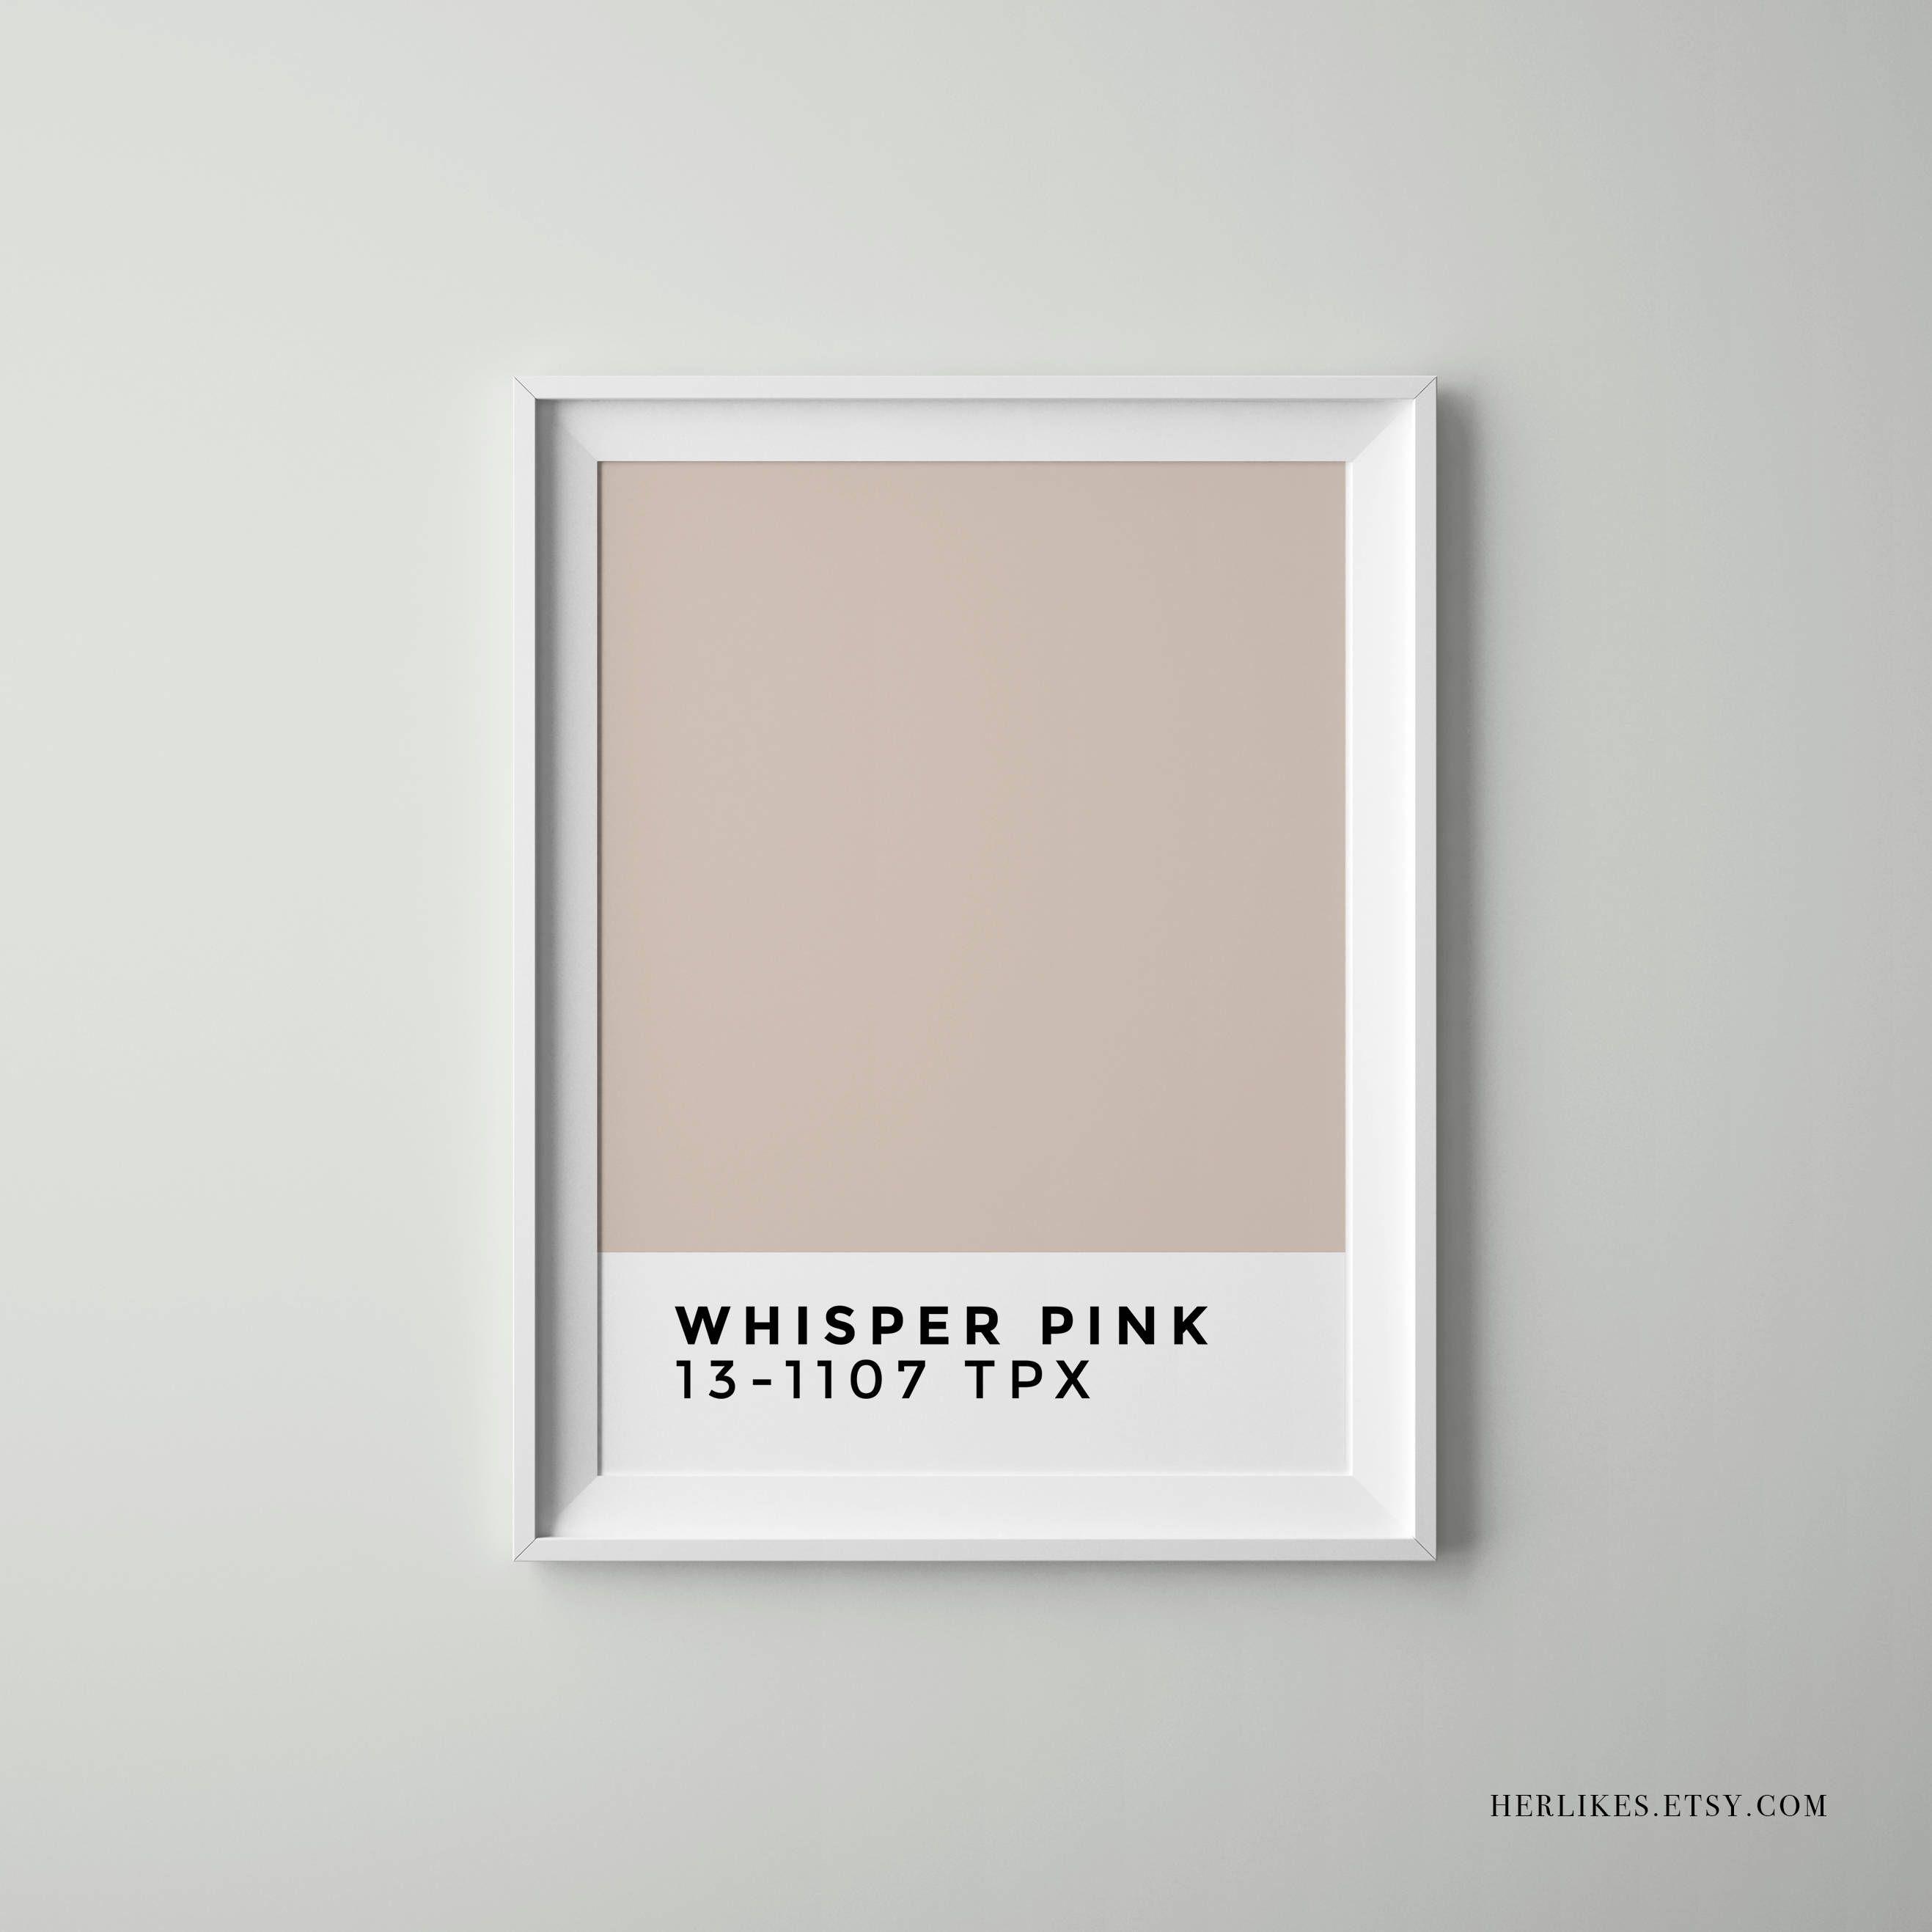 Whisper Pink, Pantone, Minimalist Home Decor, Scandinavian Decor Throughout Tumblr Wall Art (View 6 of 20)